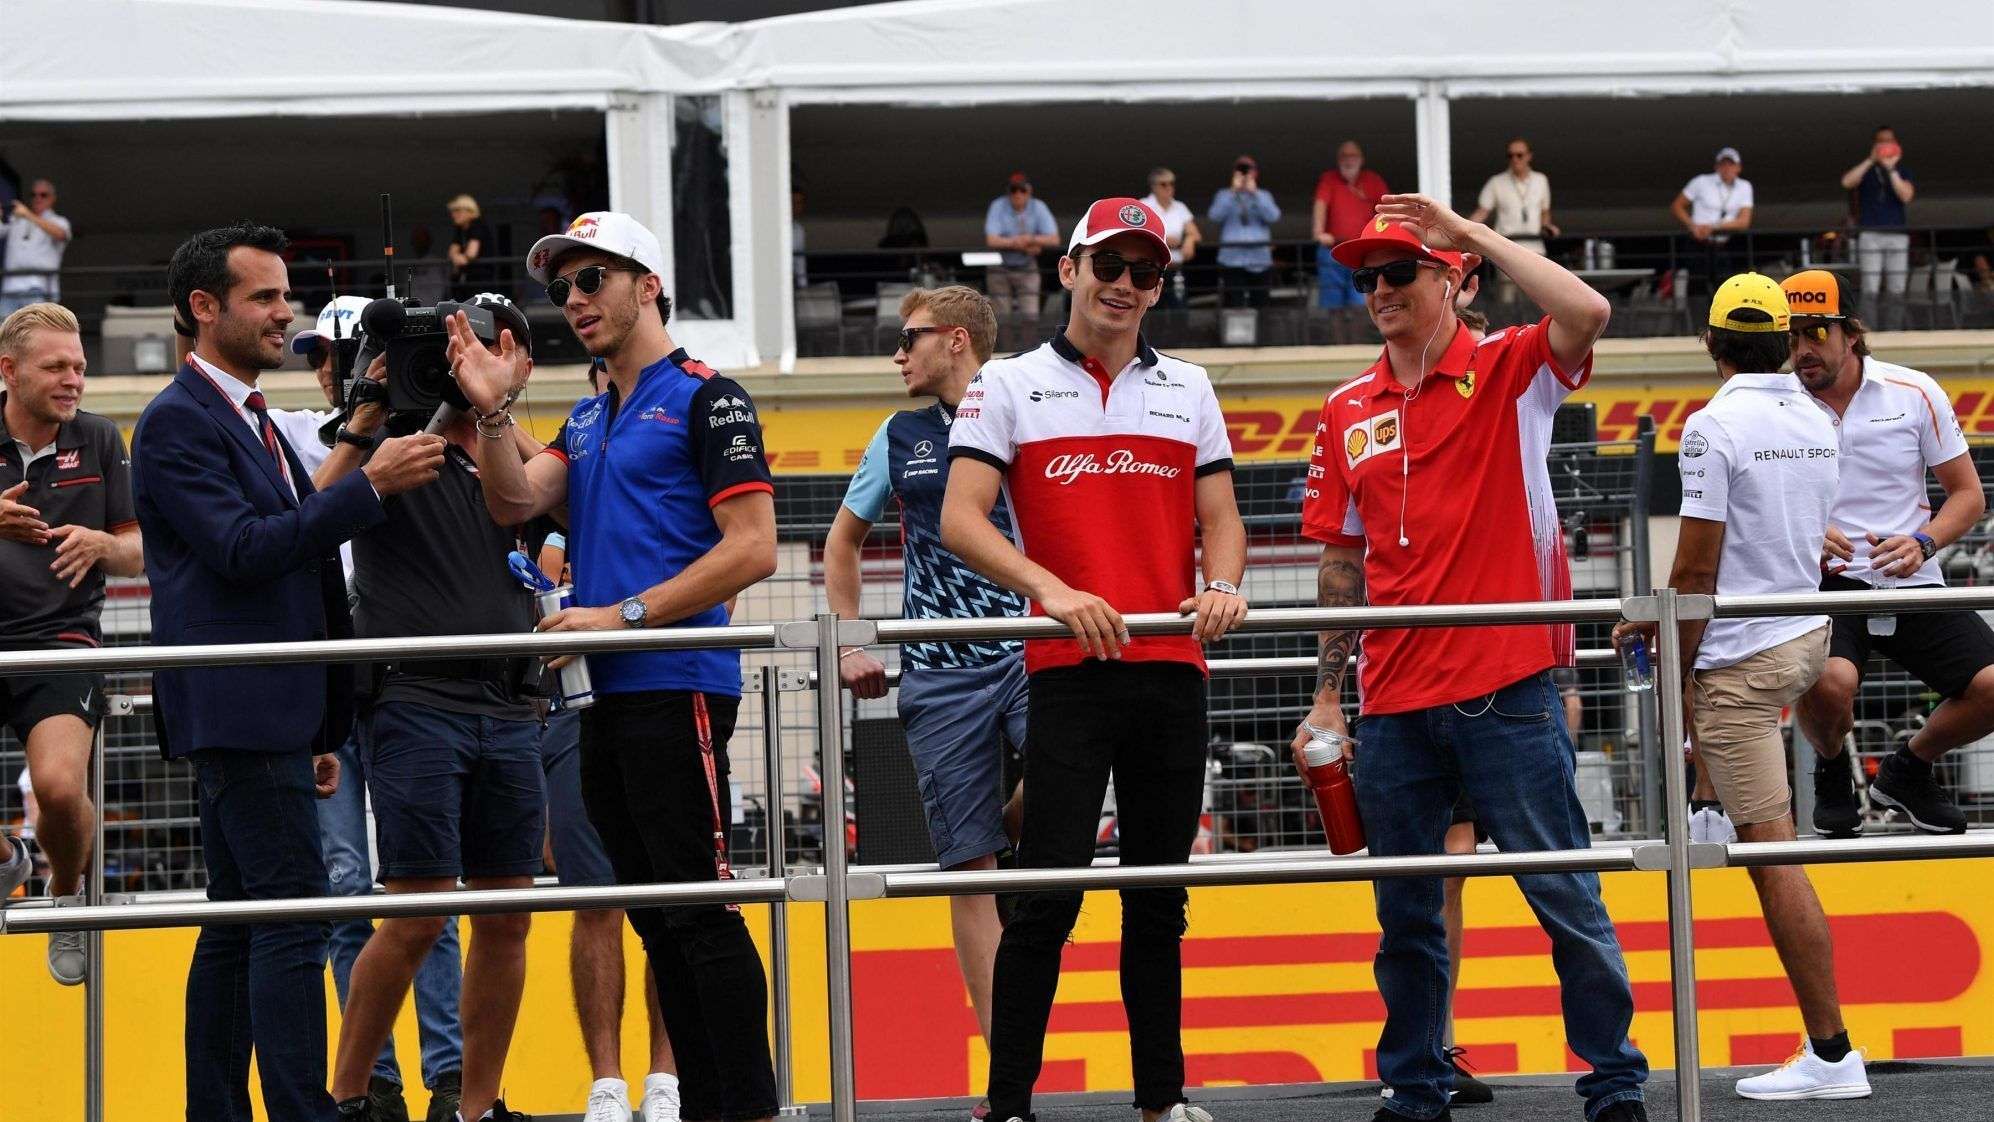 Charles Leclerc and Kimi Raikkonen